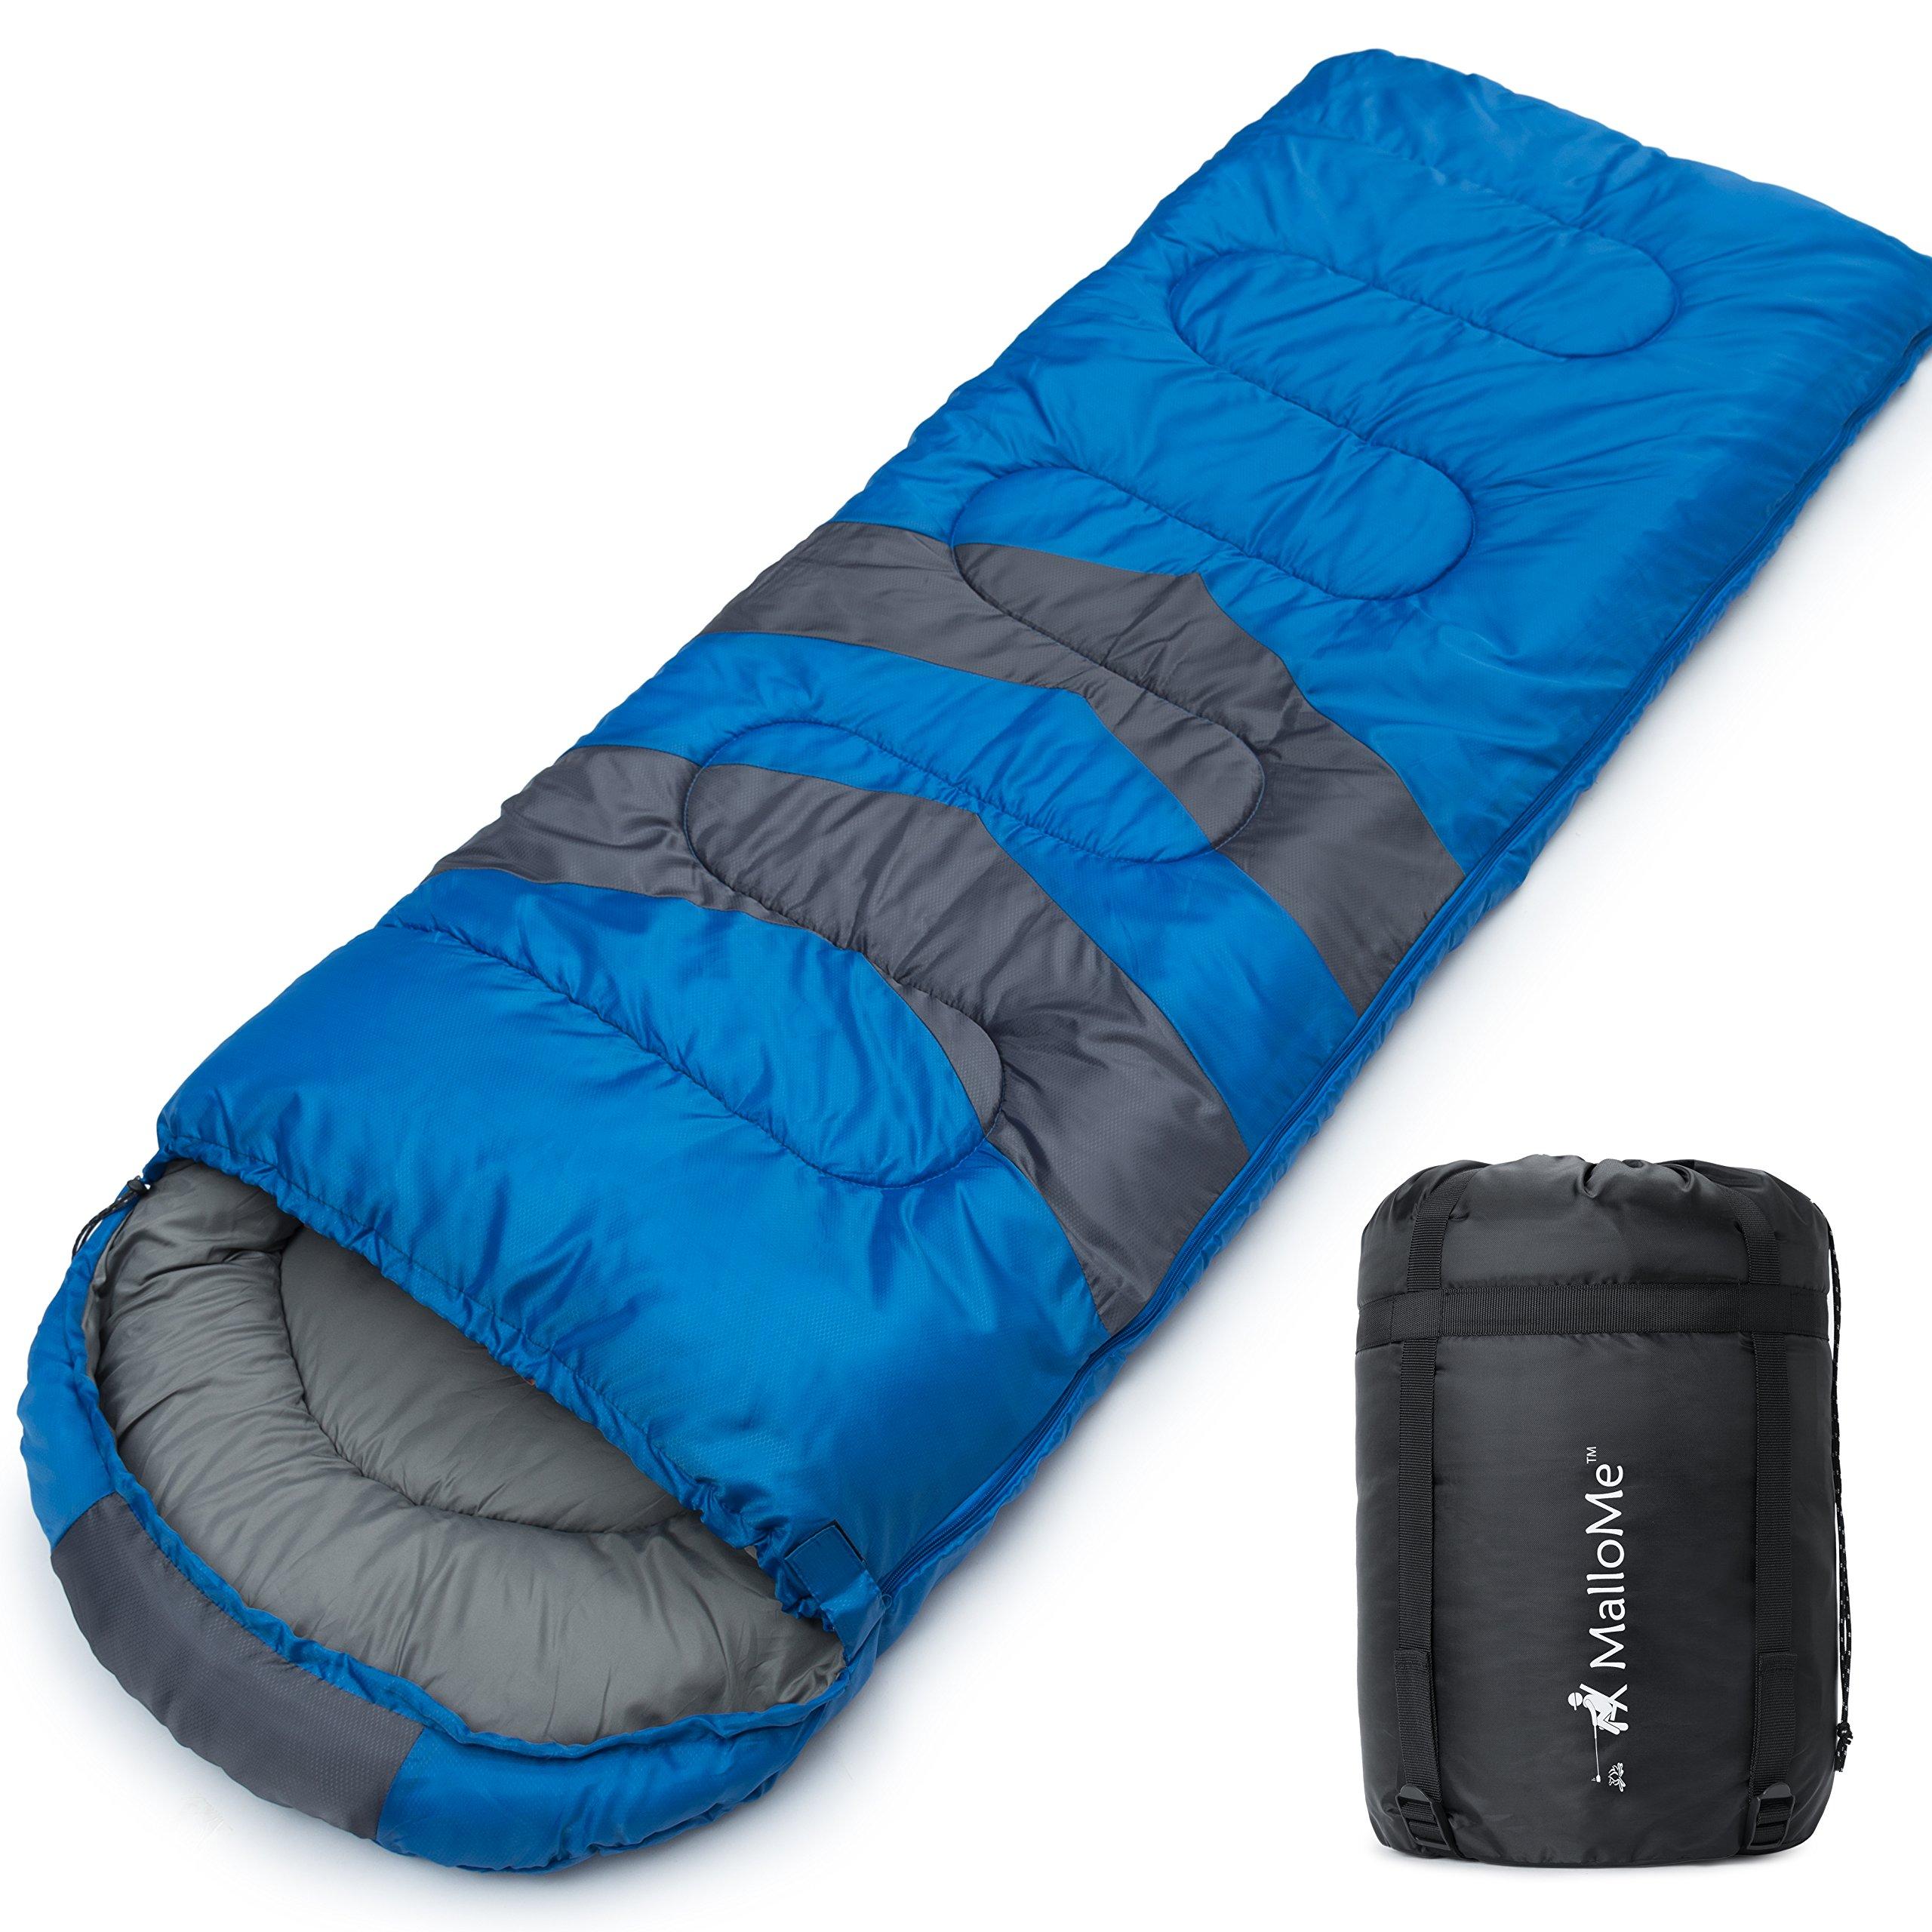 MalloMe Single Camping Sleeping Bag